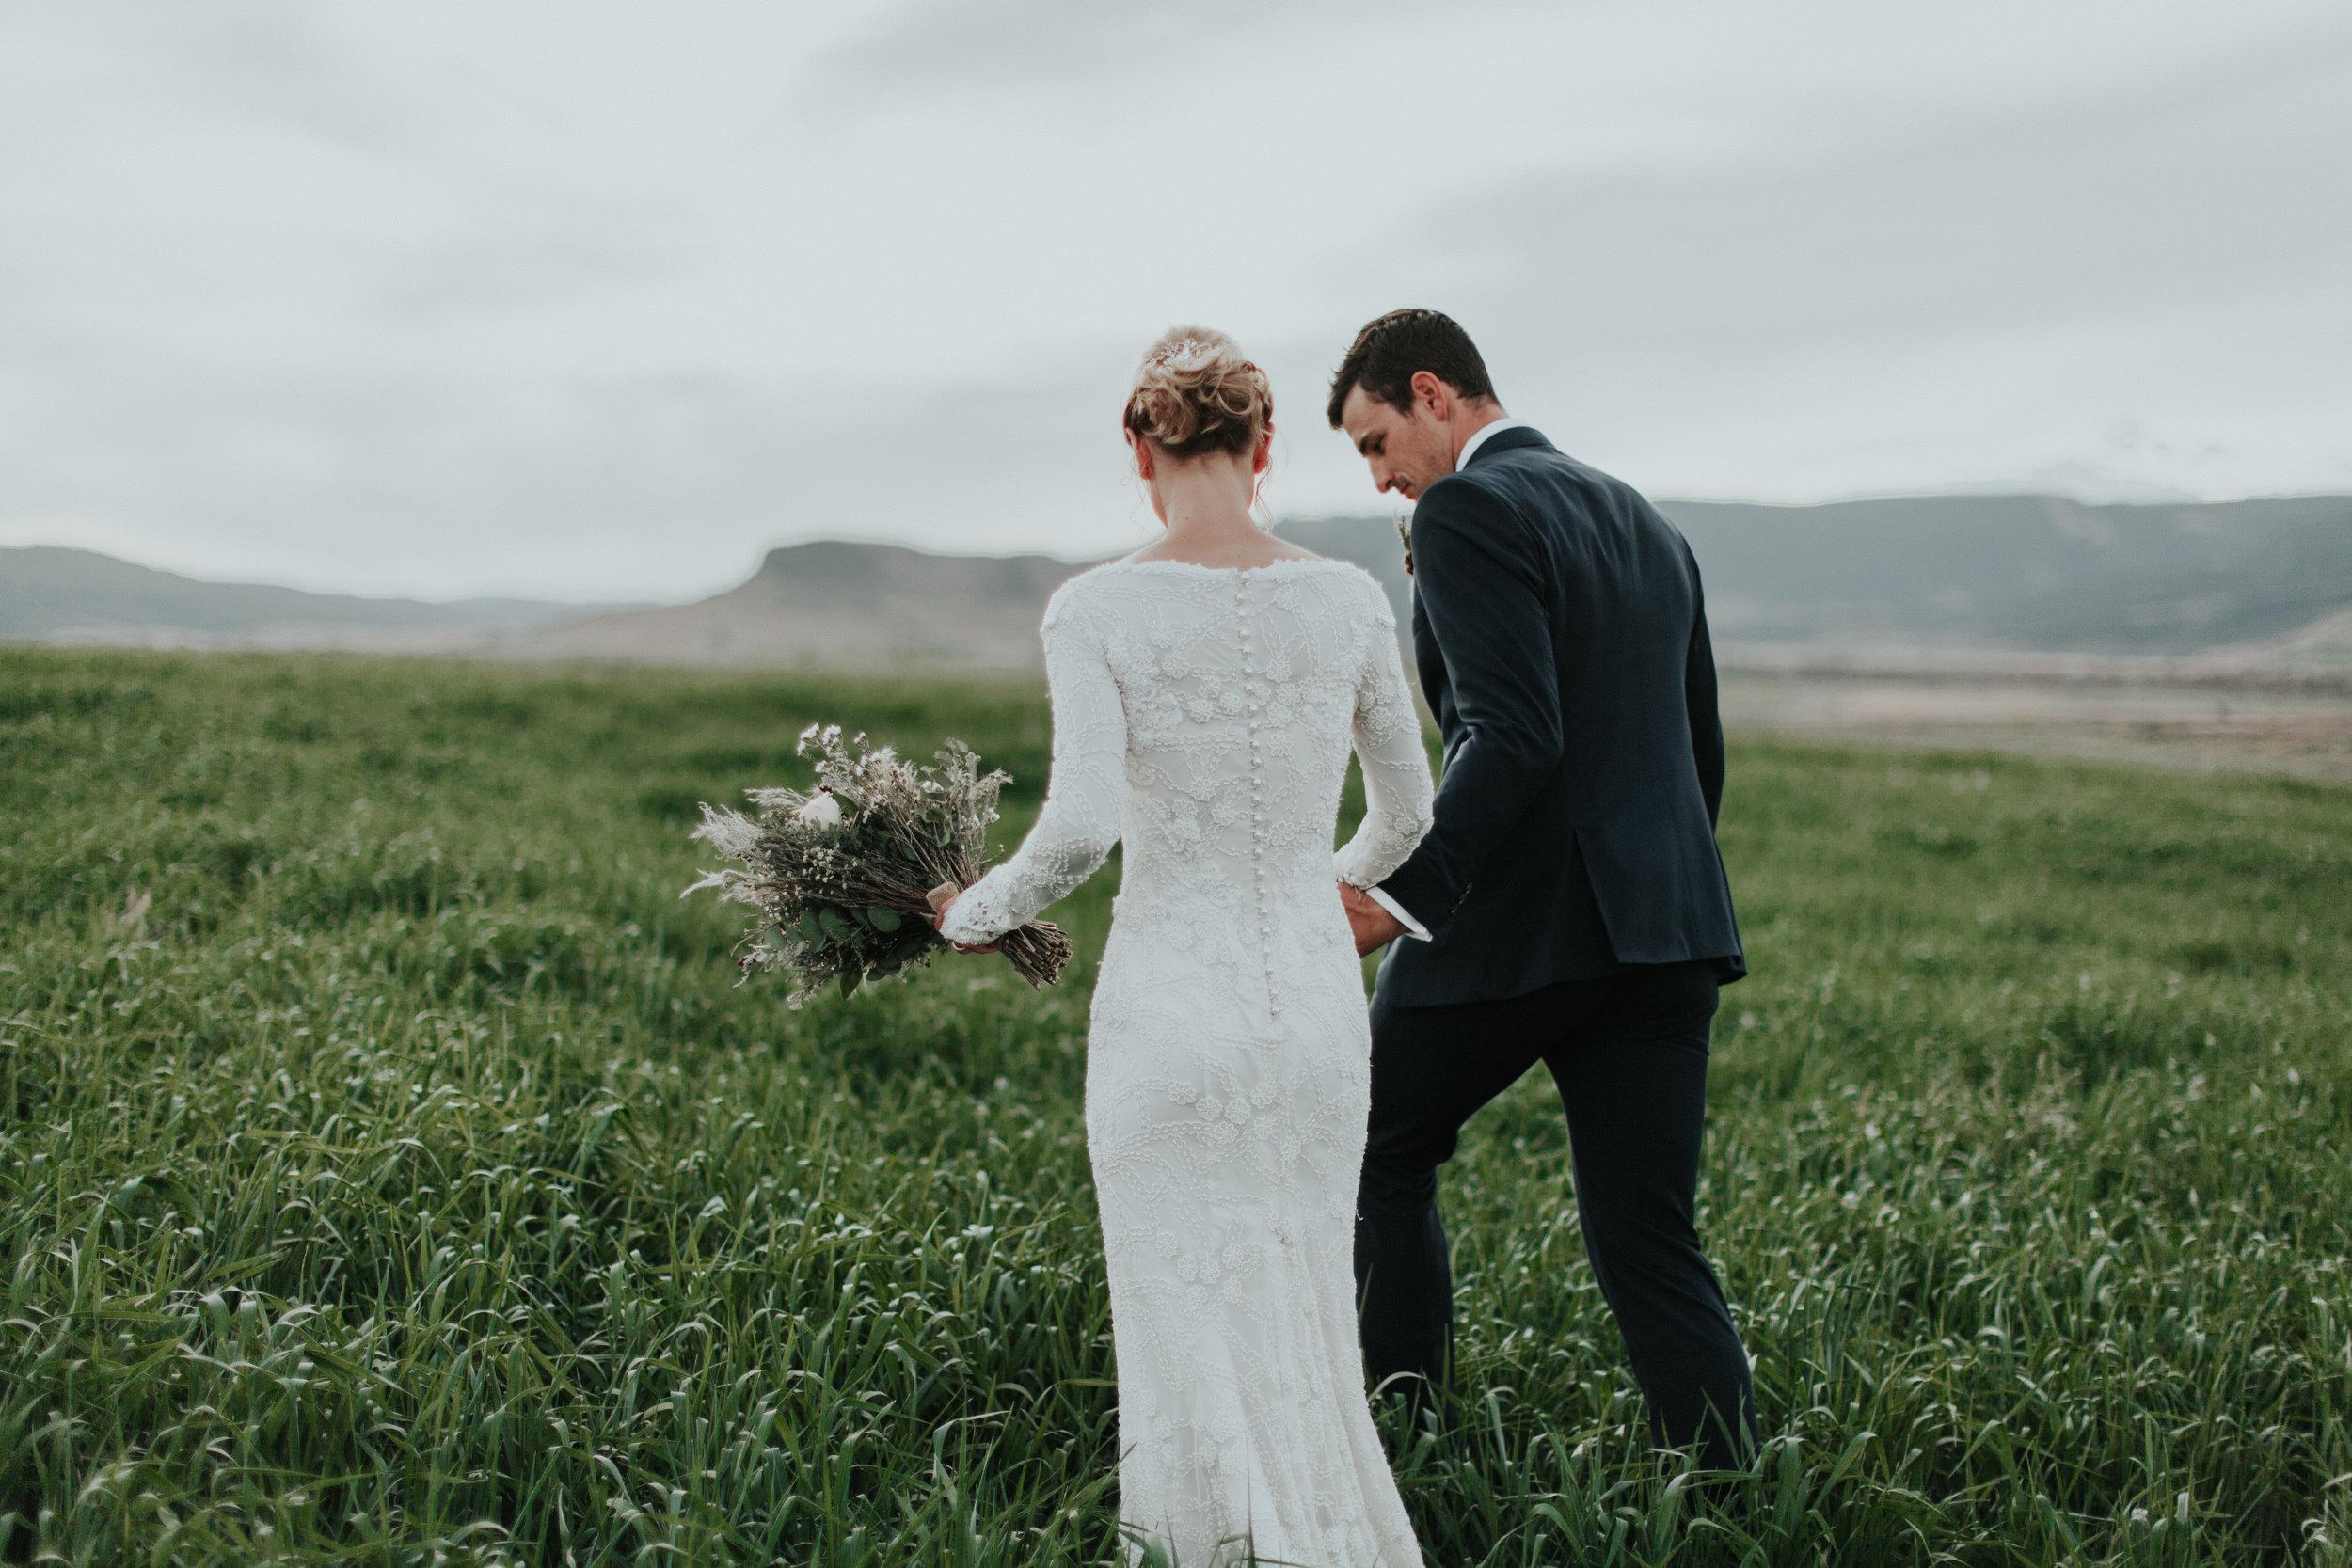 Kristi Smith Photography - Wedding Photography 1.jpg